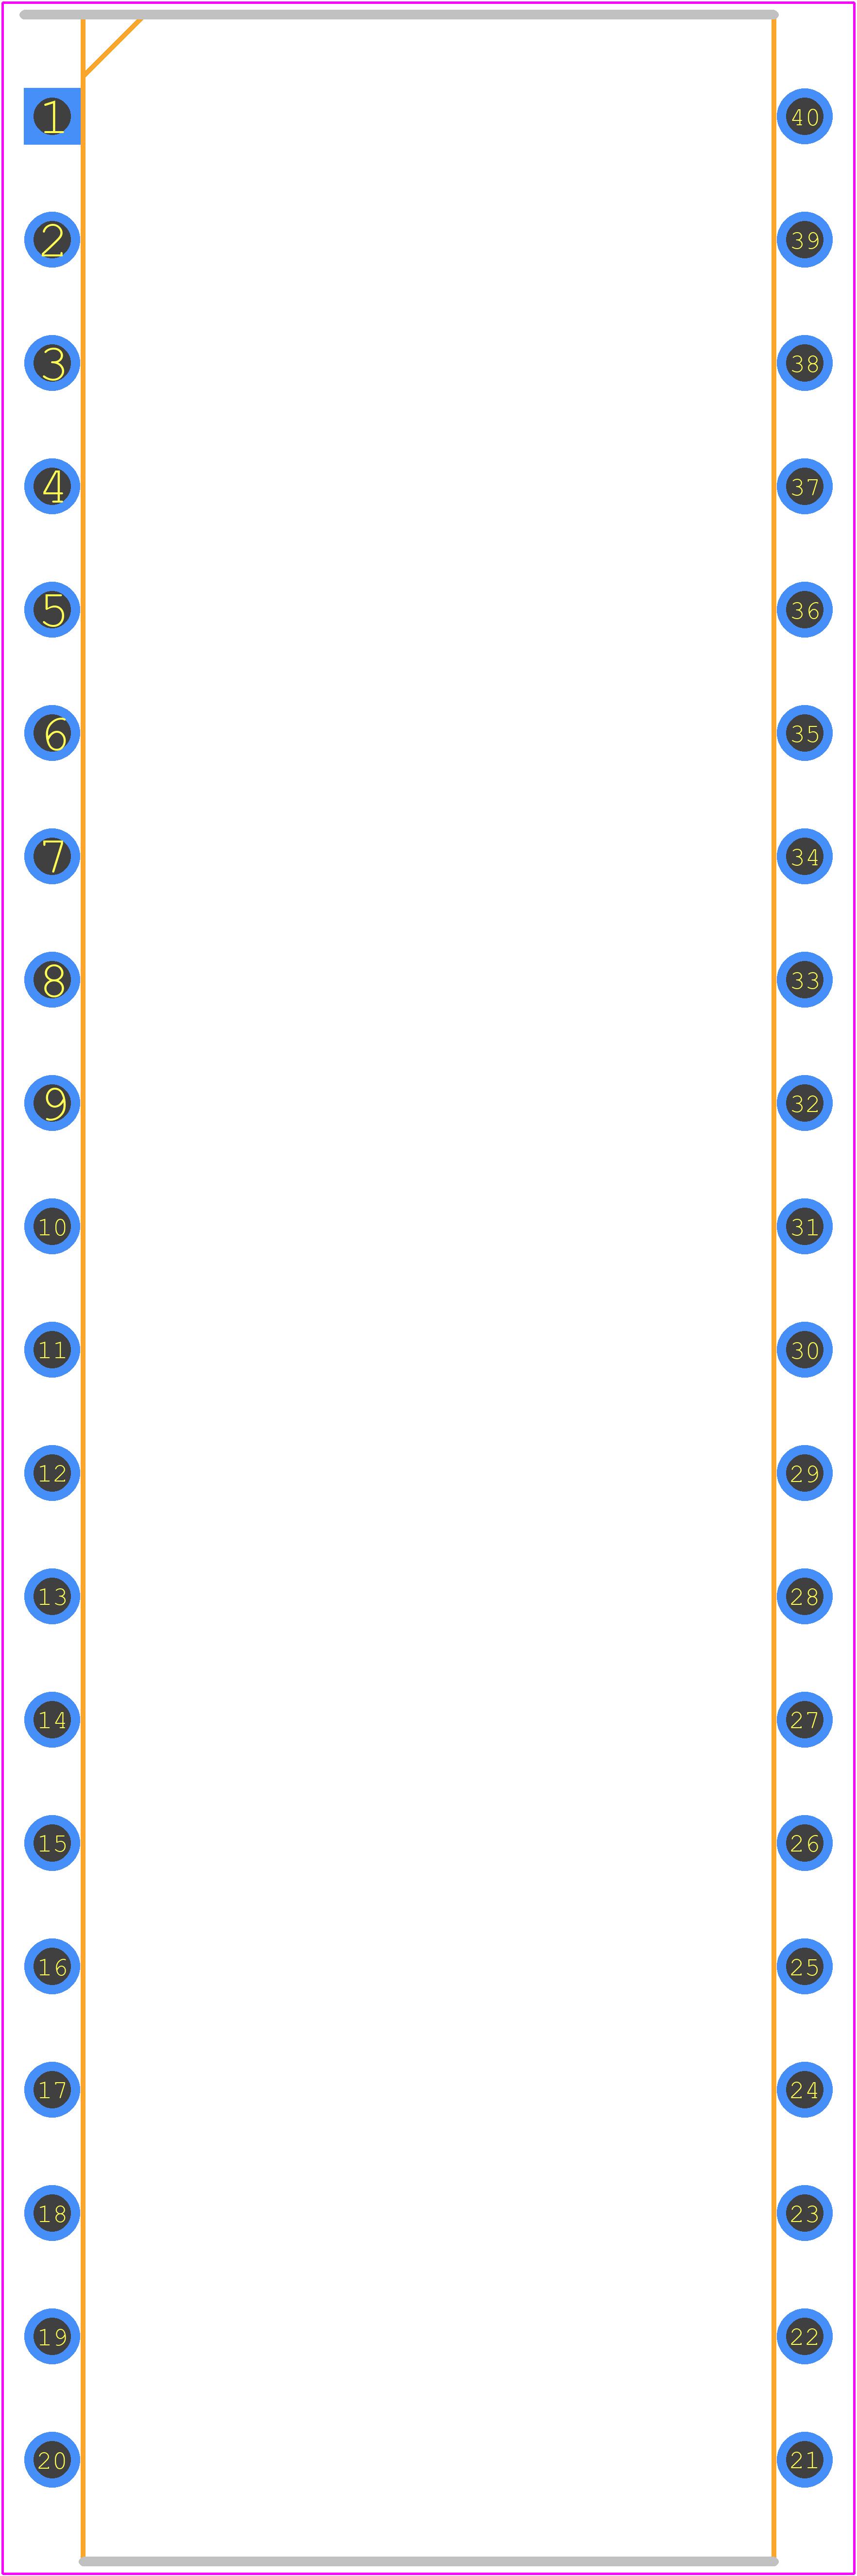 PIC18F4550-I/P - Microchip PCB footprint - Other - DIP254P1524X635-40